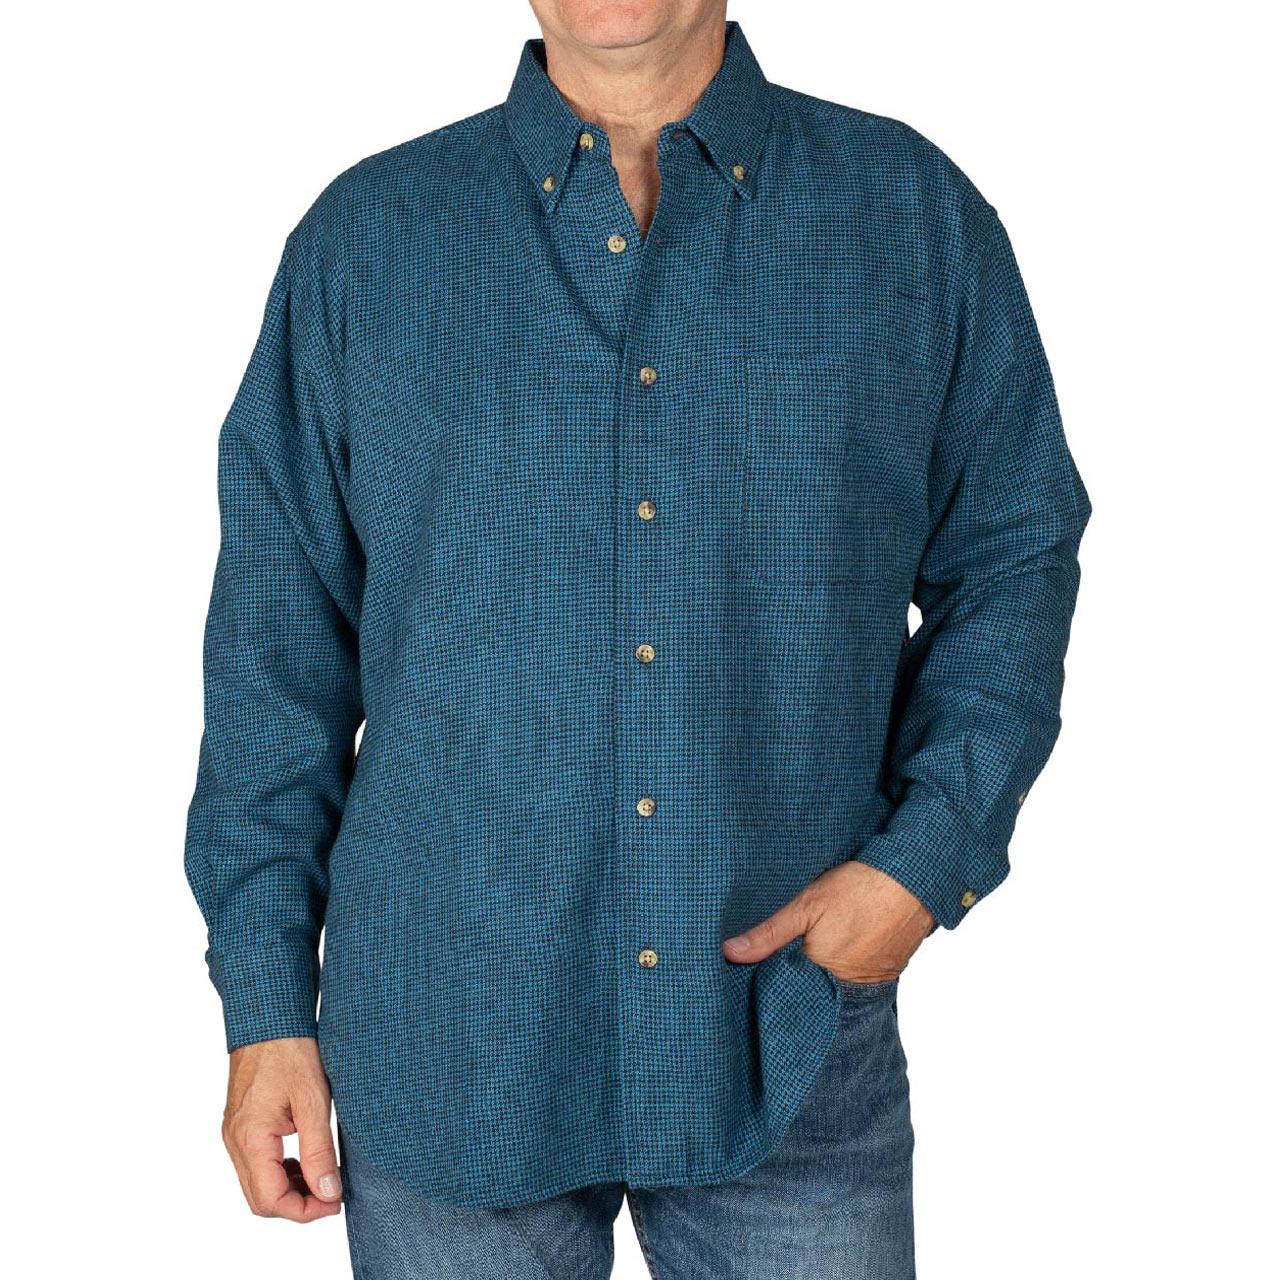 Men's Woodland Trail By Palmland Long Sleeve 100% Cotton Woven Herringbone Flannel Shirt #5900-300